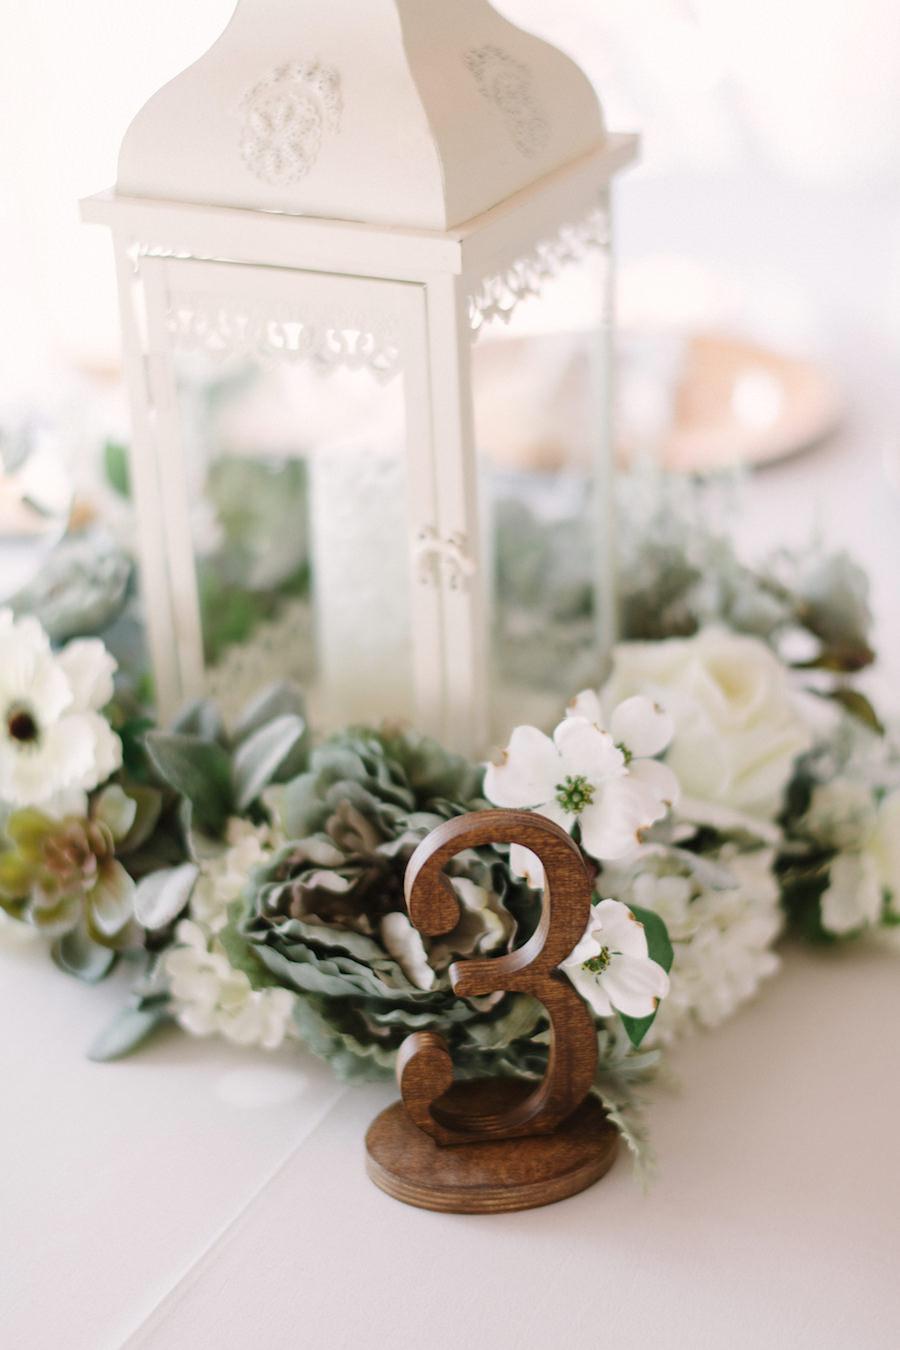 Rustic Elegant Wedding Decor With White Lanterns Wooden